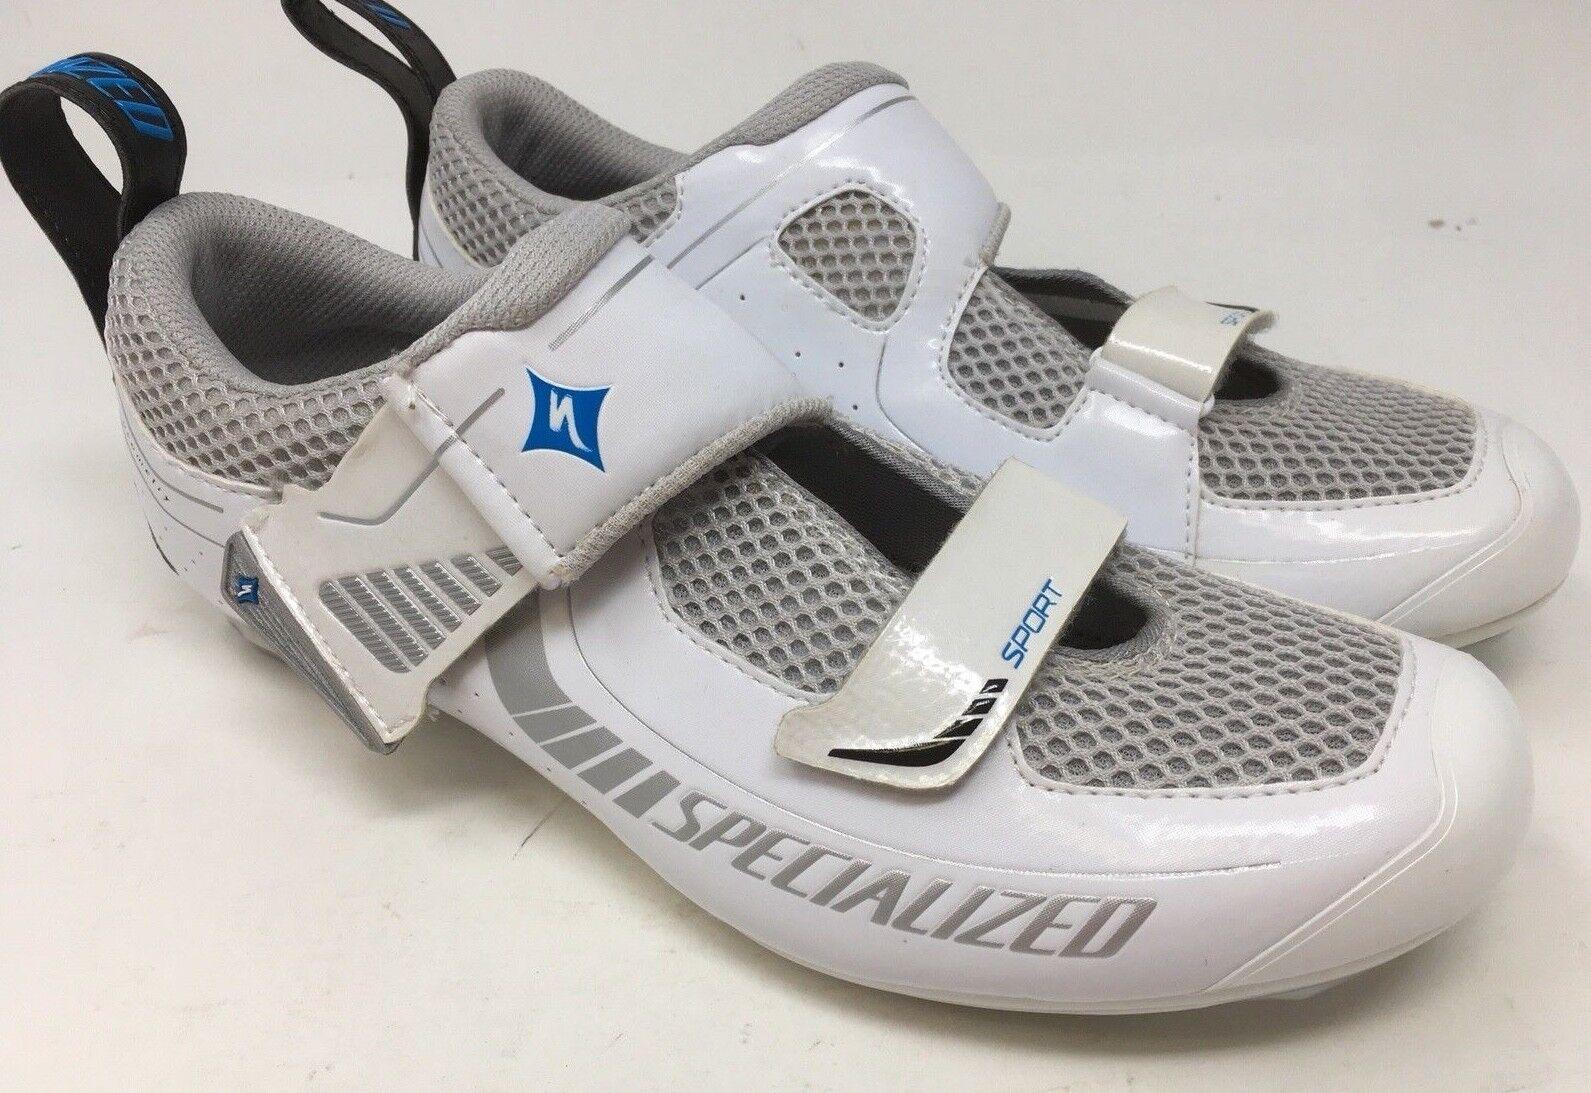 NEW SPECIALIZED Women's TRIVENT Sport Tri Triathlon   US 7.25 shoes  promotions